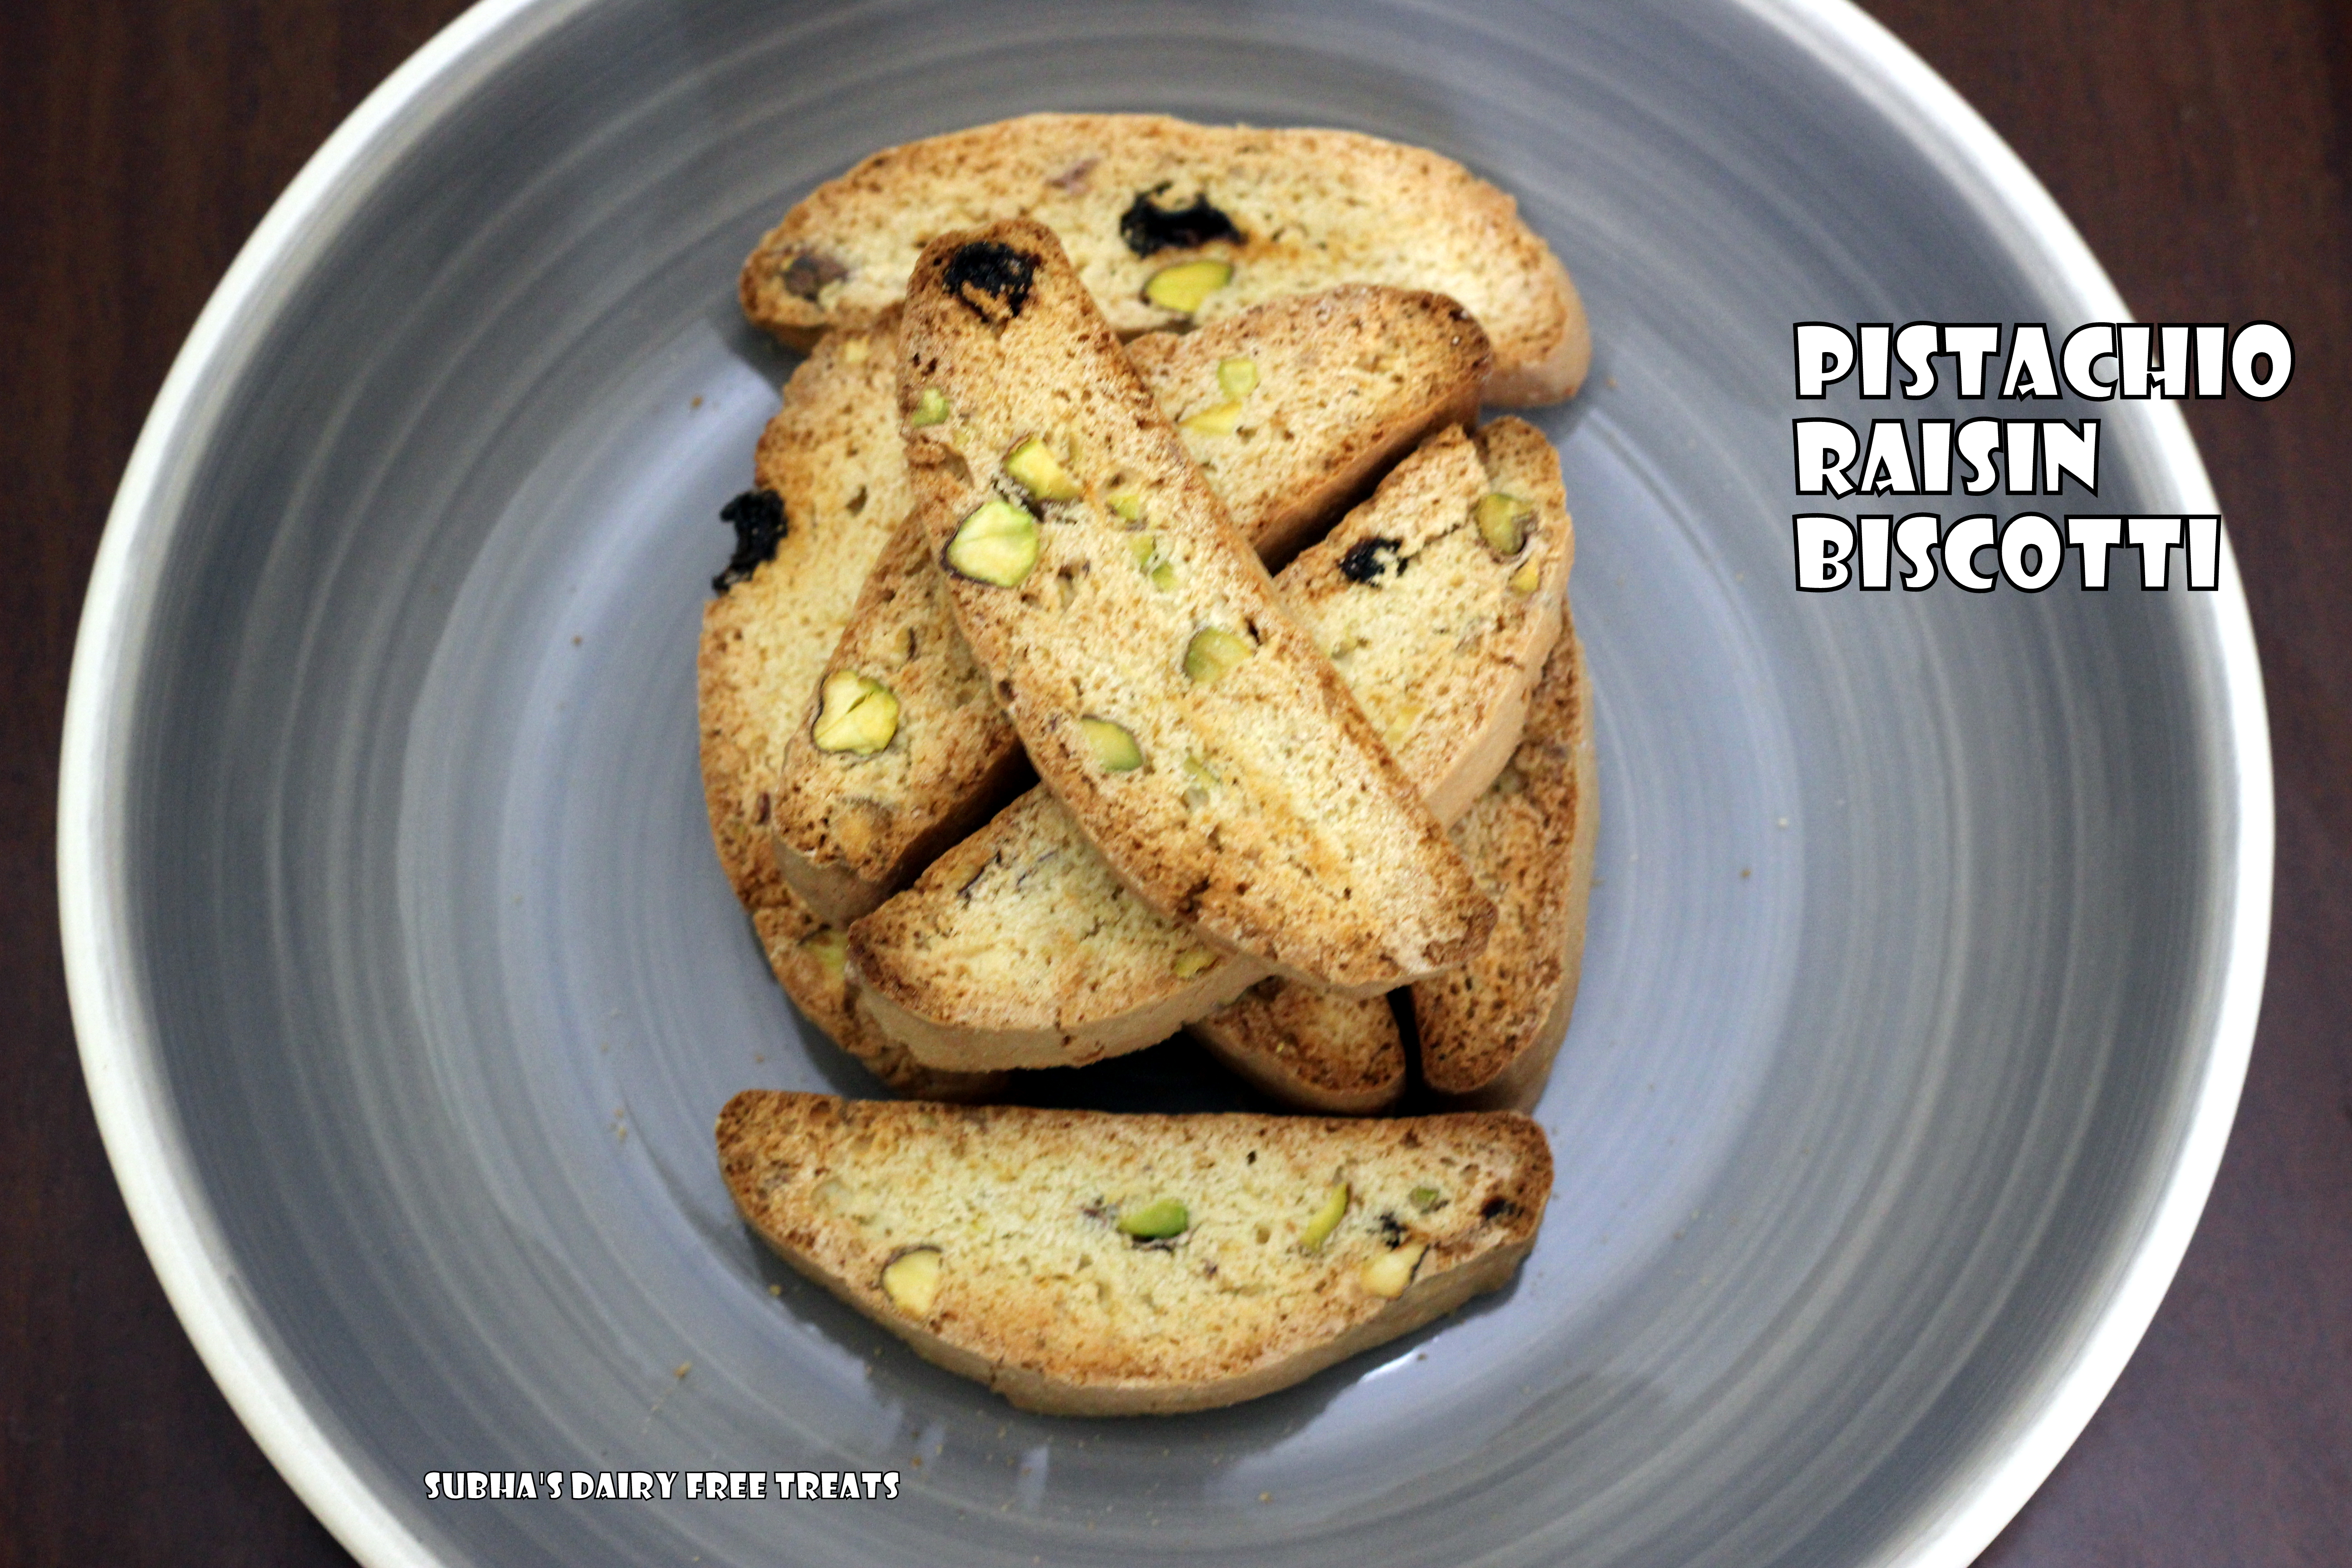 Pistachio - Raisin Biscotti | Subha's Dairy Free Treats